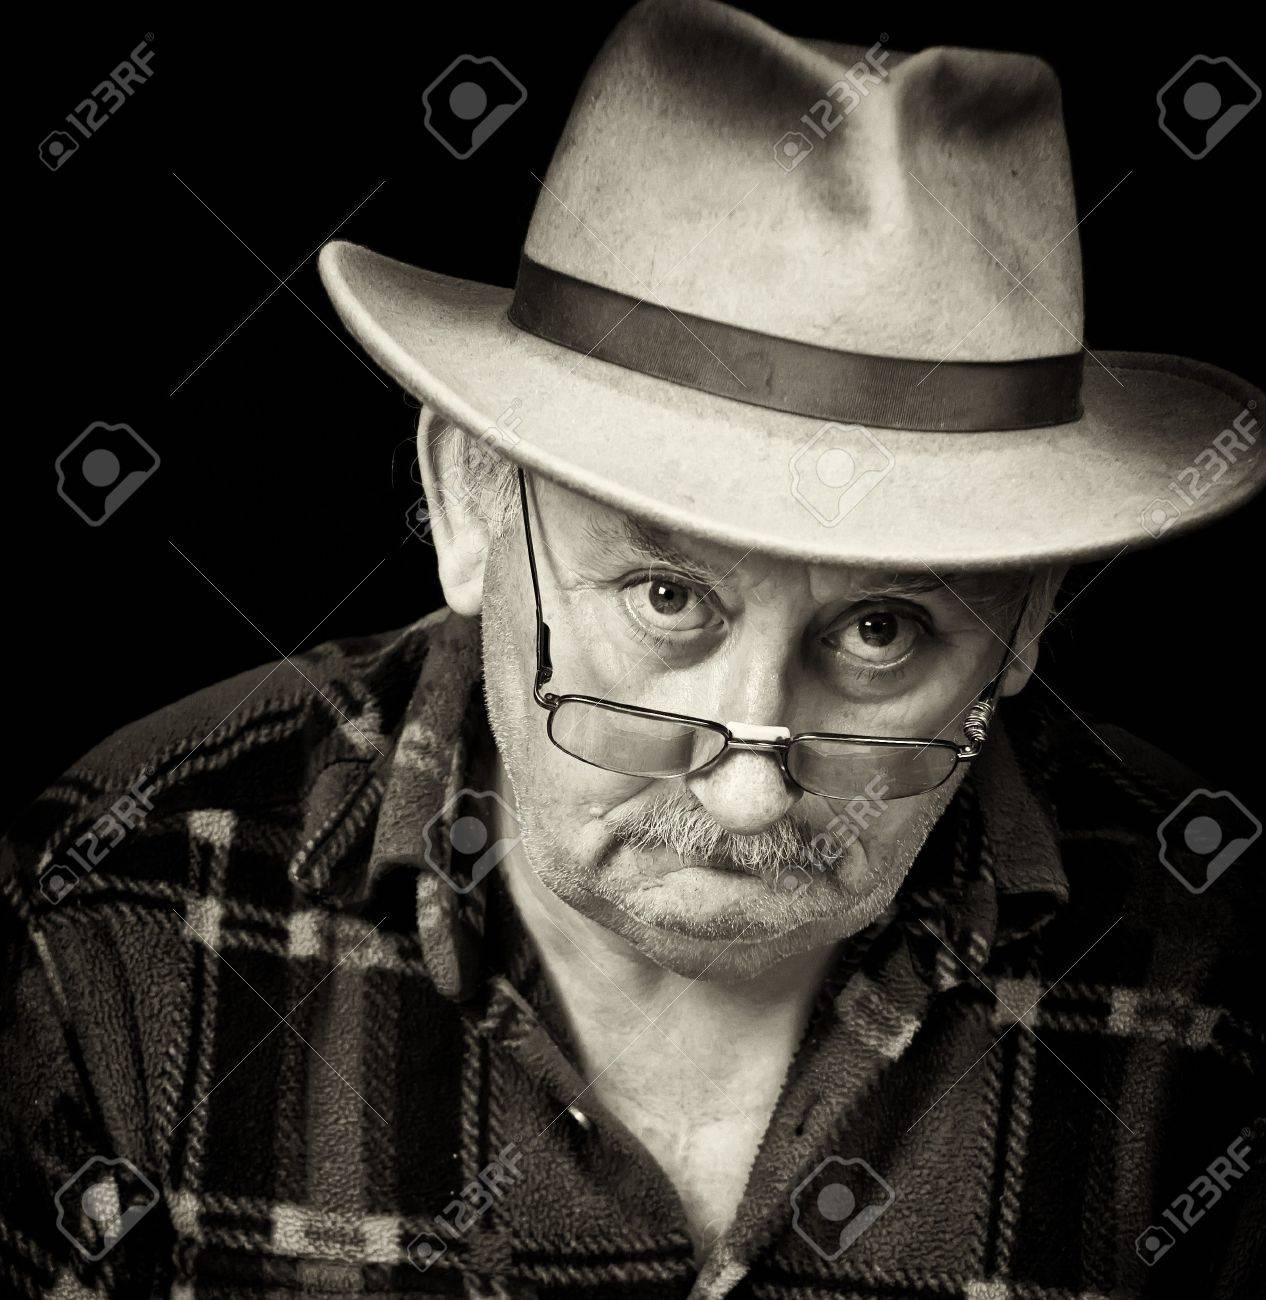 photo of senior male with sad or grumpy face portrait - 7610152